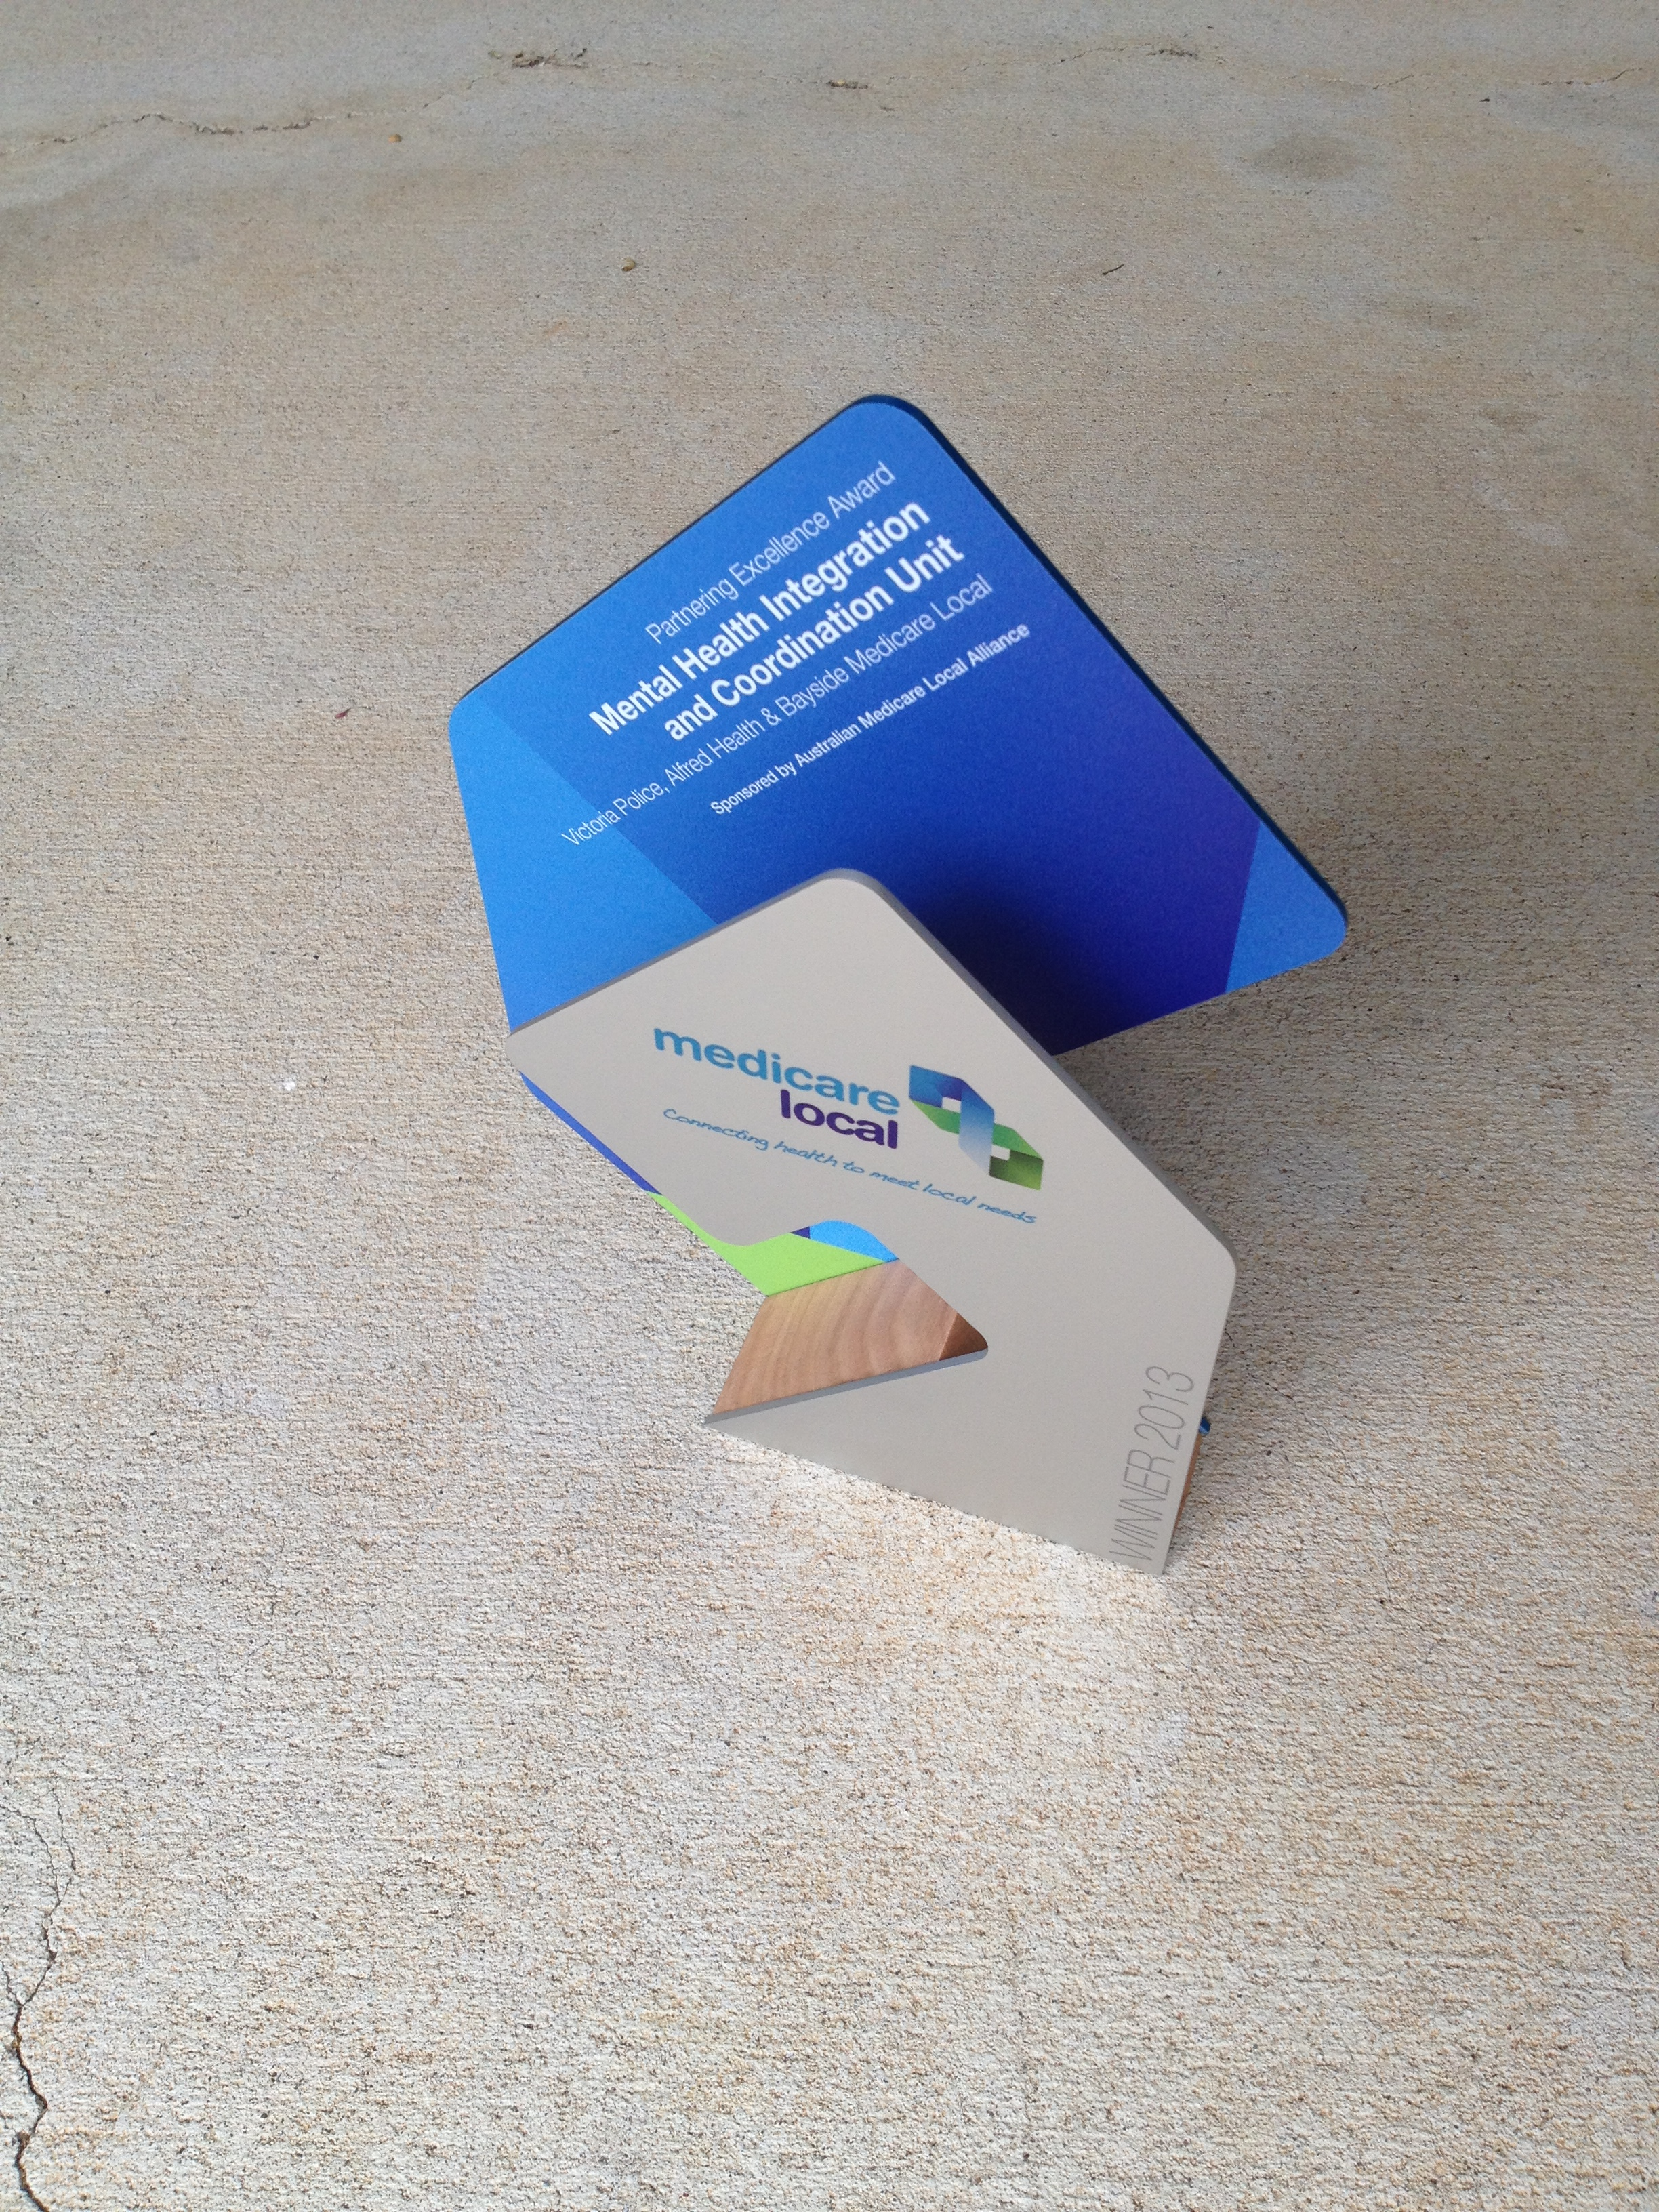 Medicare Local Awards - Custom Trophies